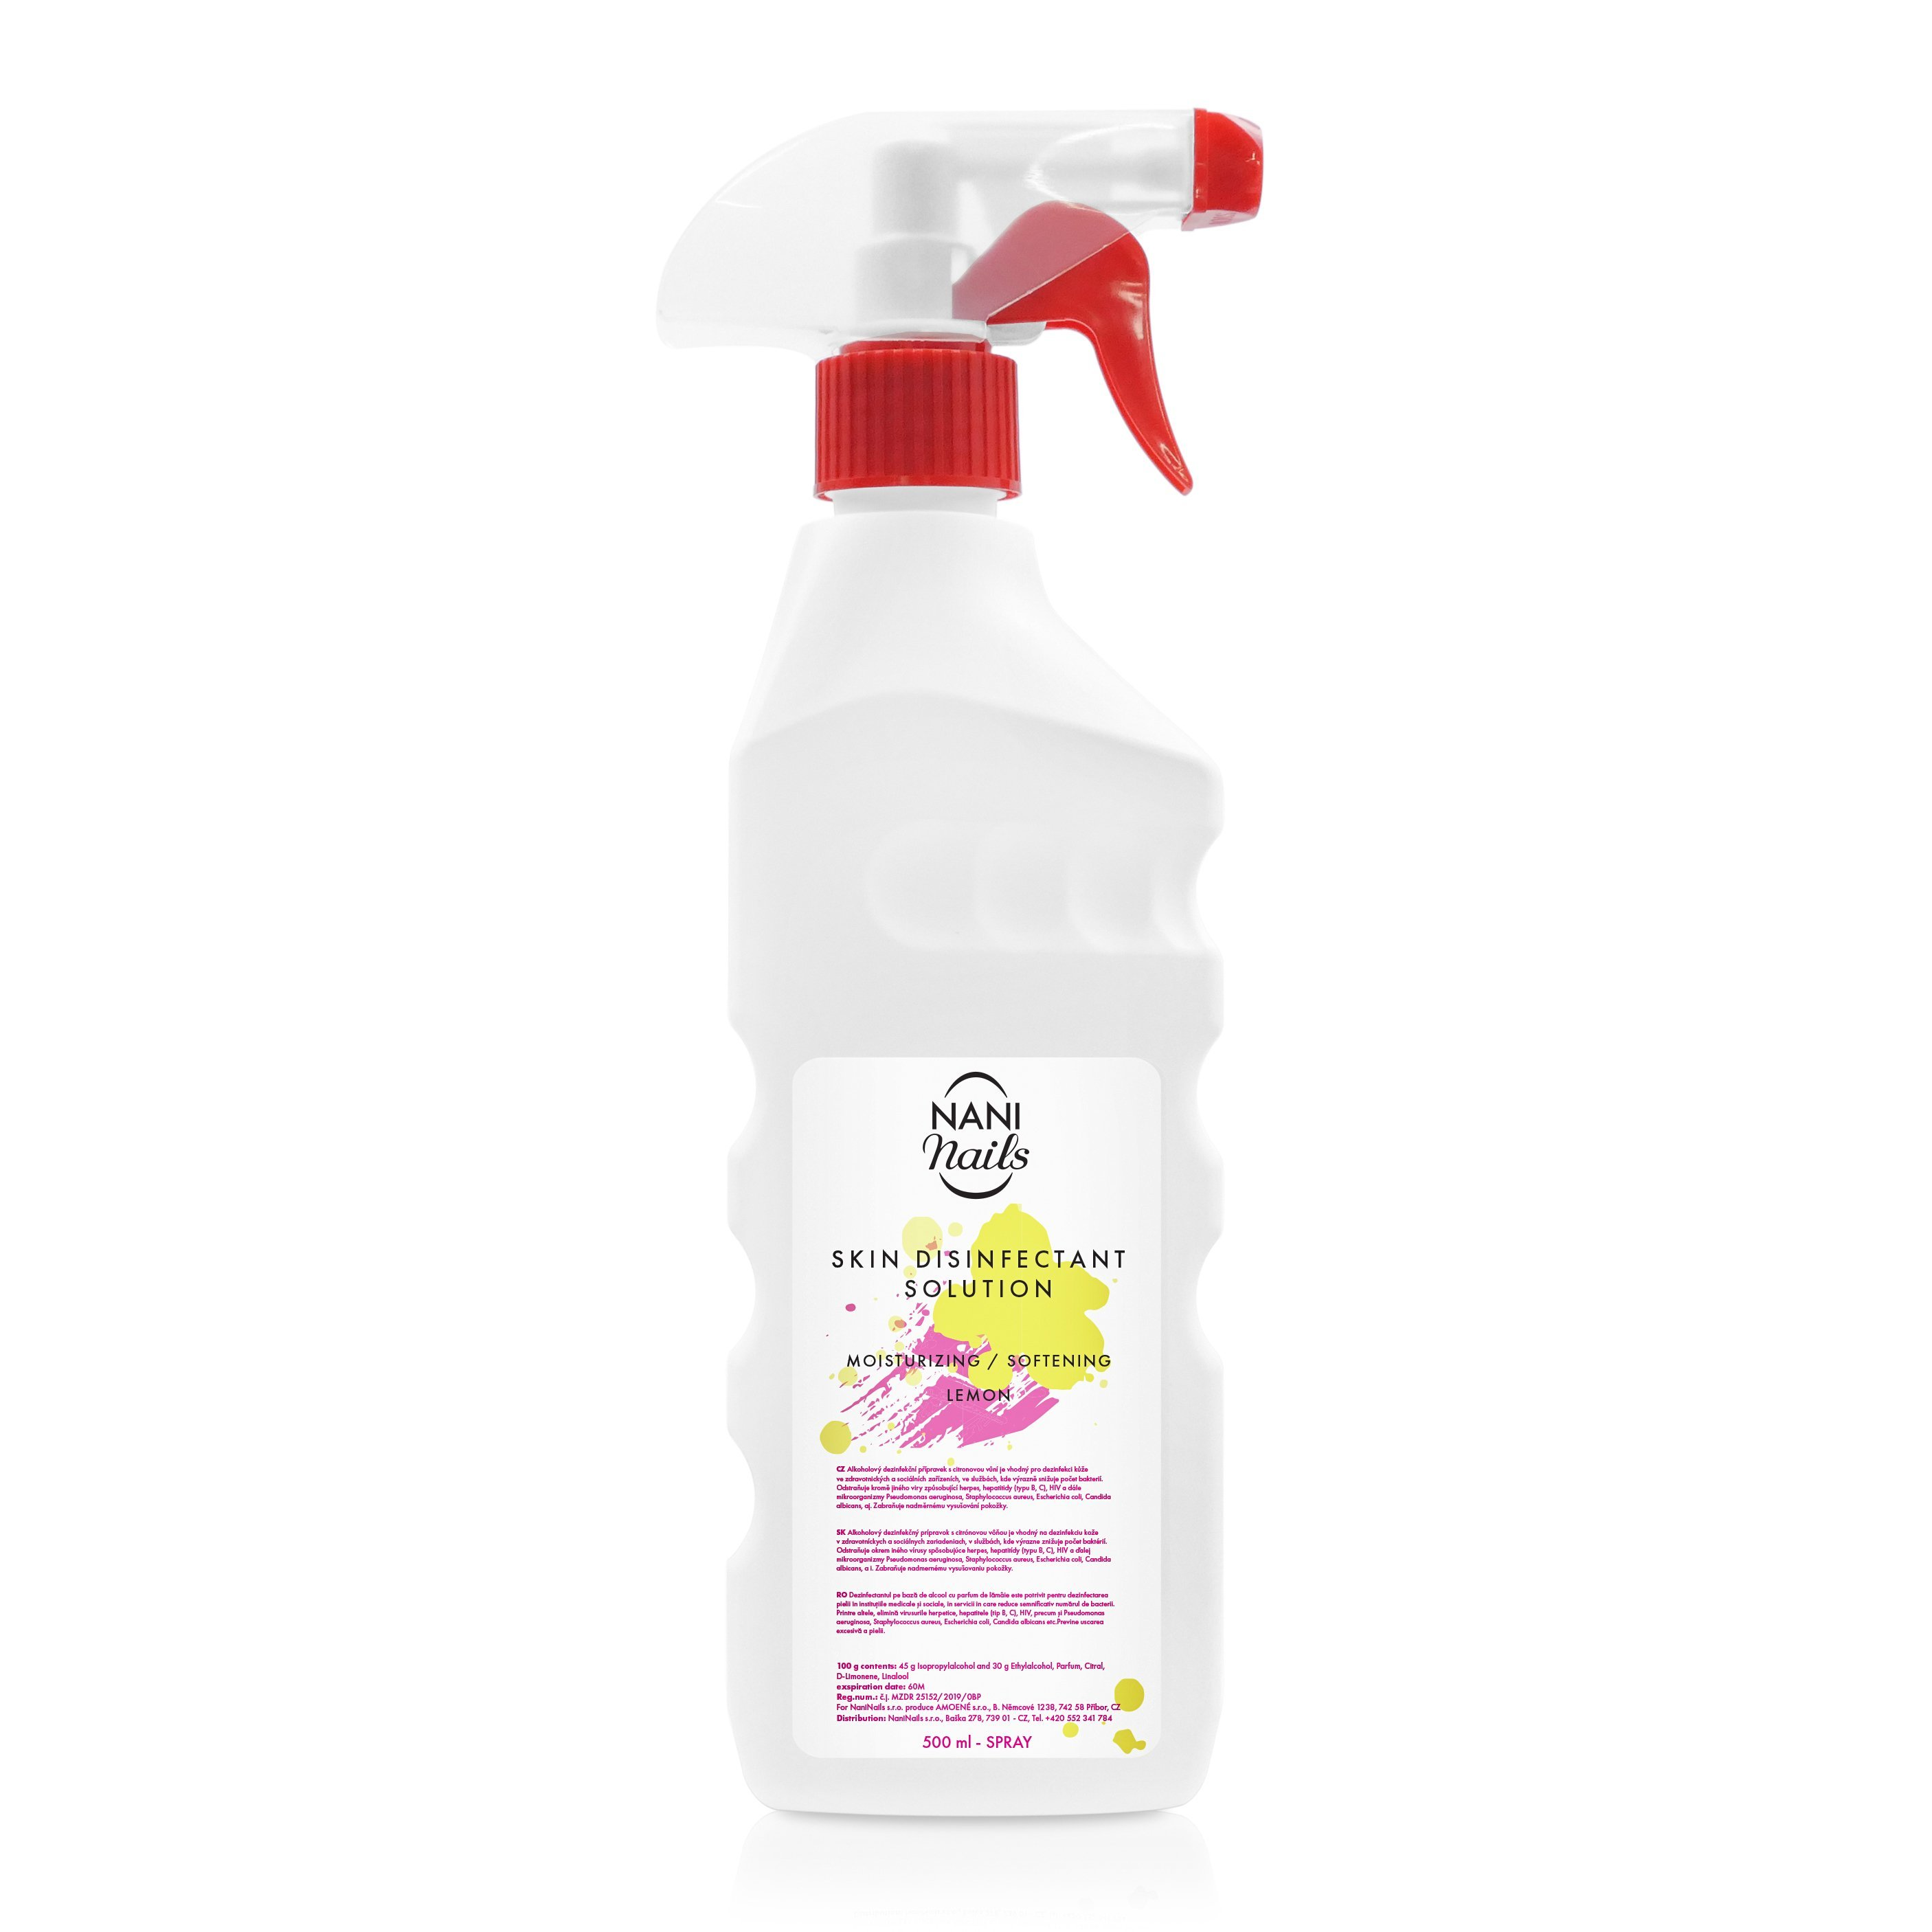 NANI Lavosept dezinfekcia na ruky 500 ml - Lemon